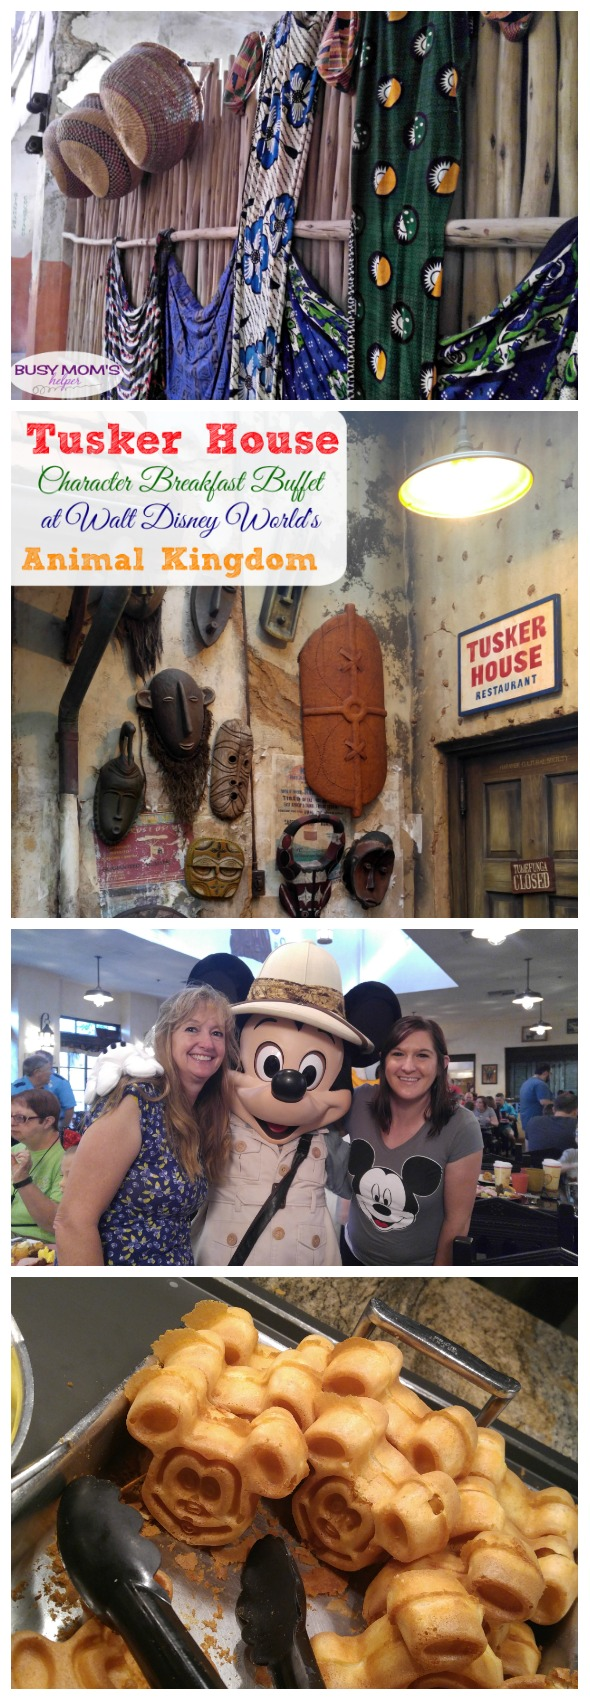 Tusker House Character Breakfast Buffet at Walt Disney World's Animal Kingdom